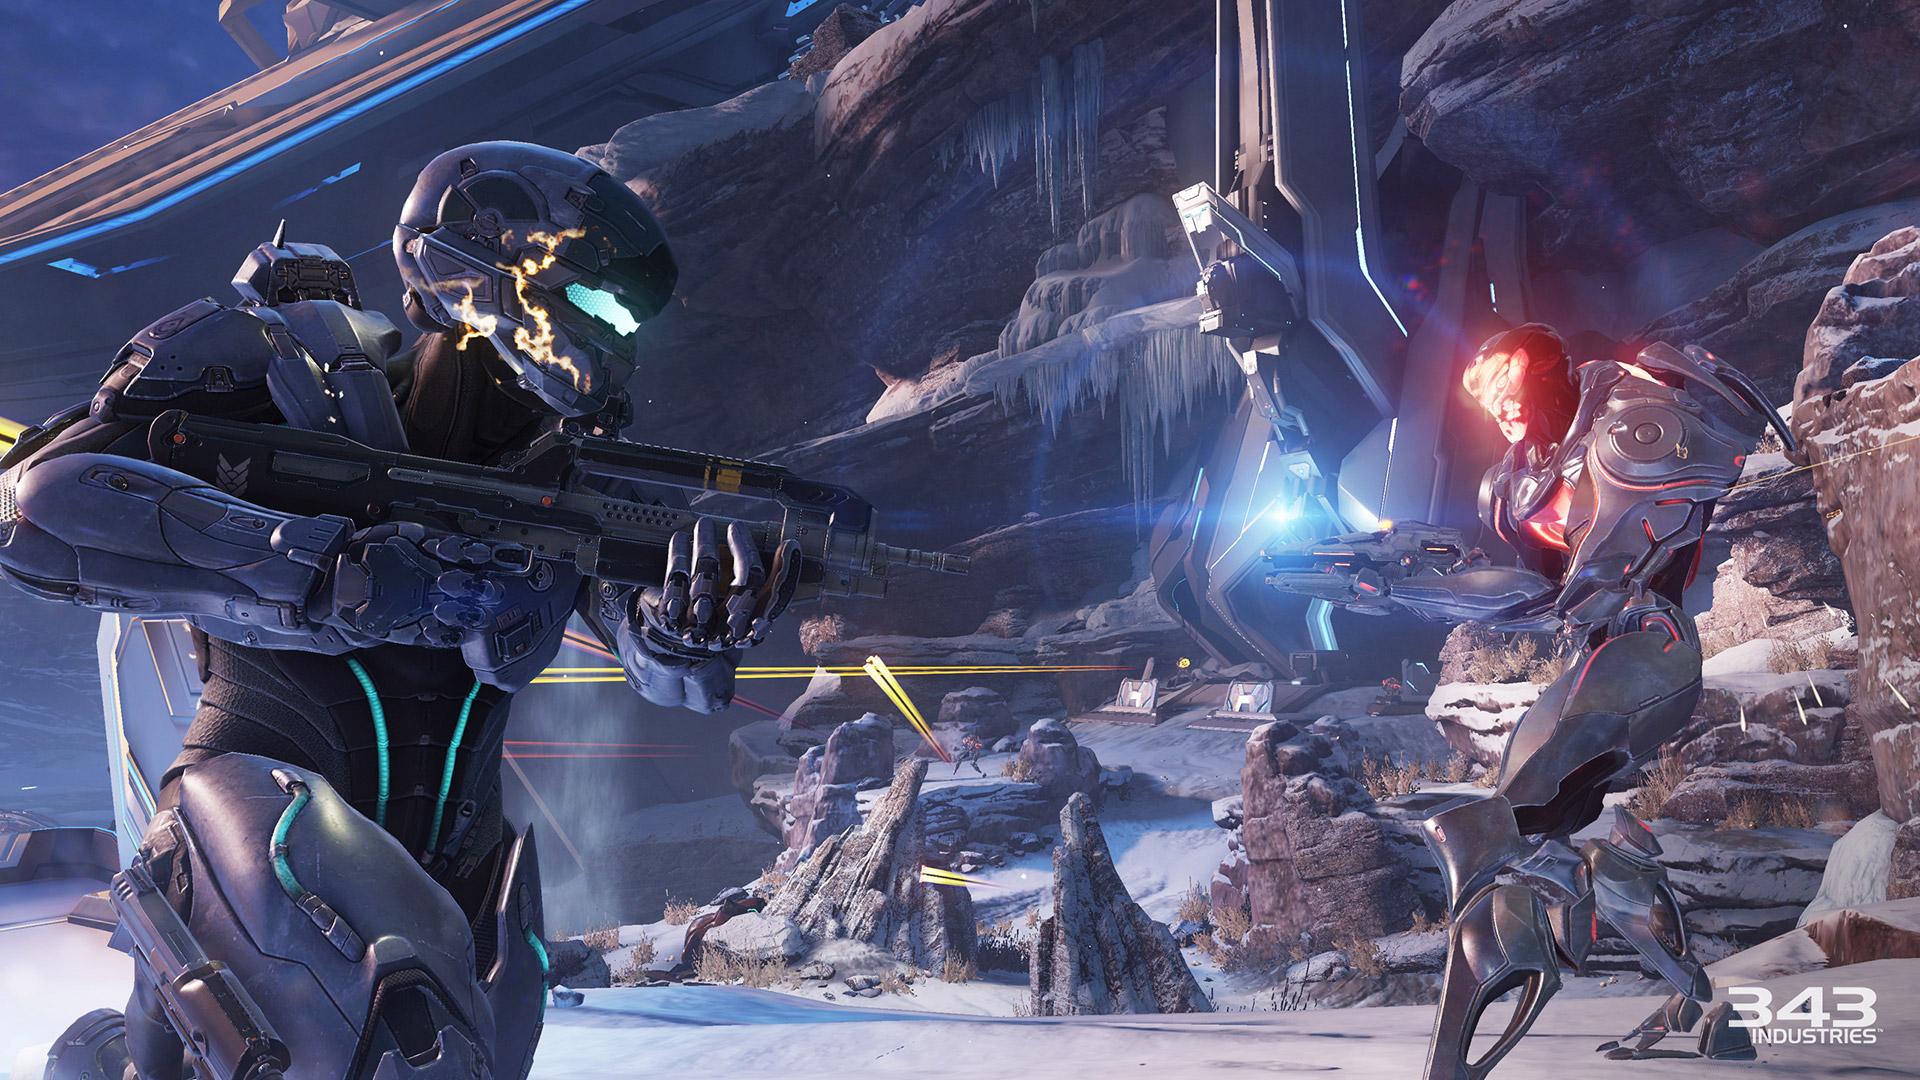 Challenges/Halo Reach